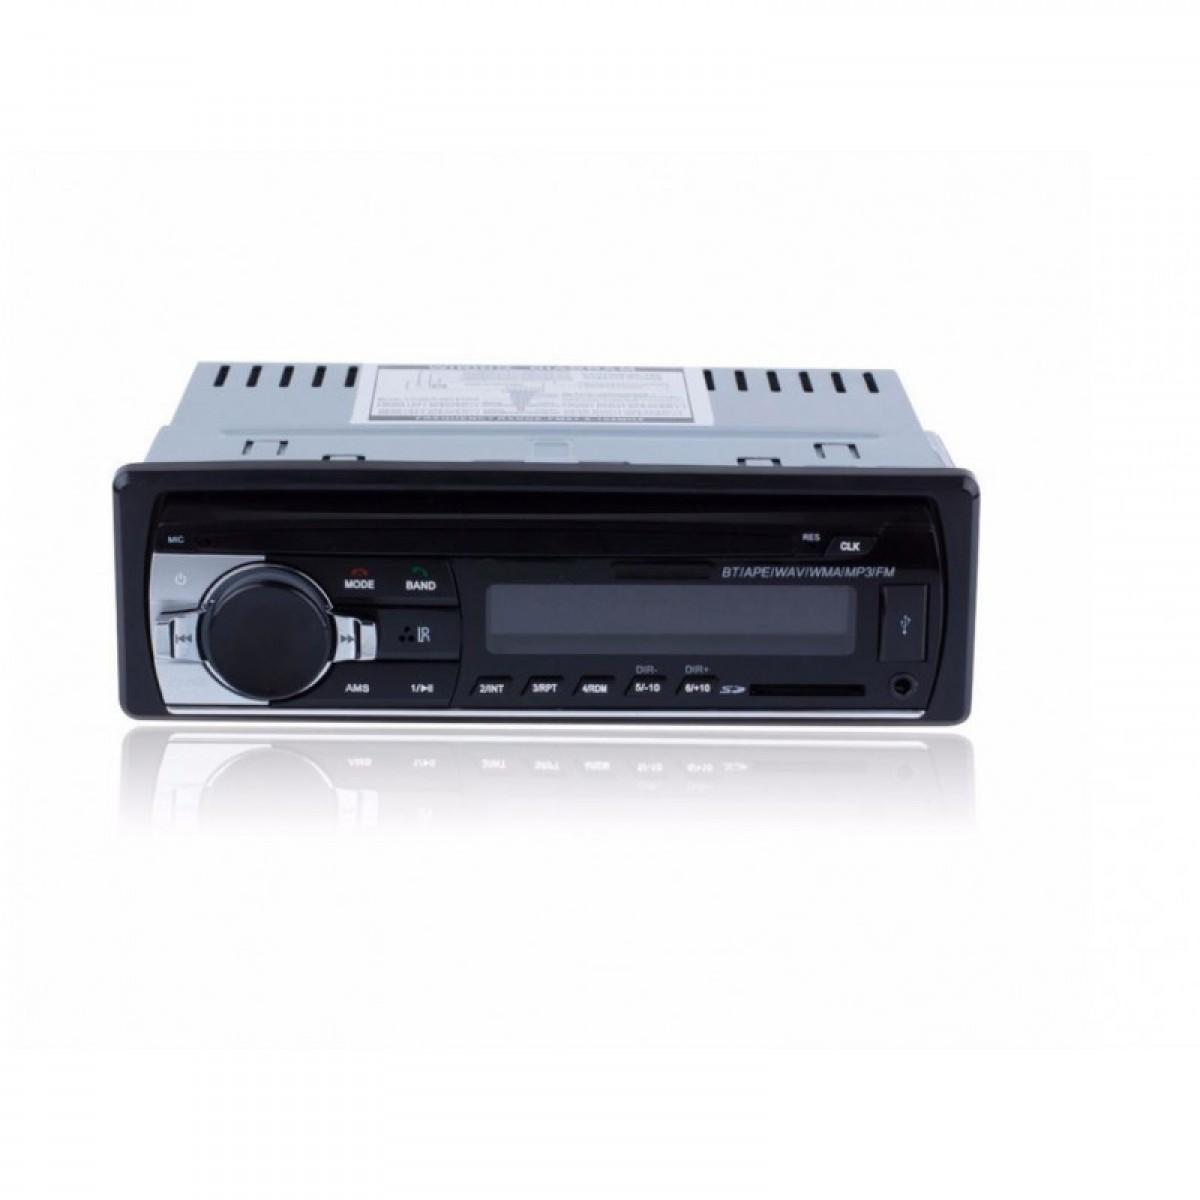 ROLINGER AUTORADIO AUTO FM MP3 USB SLOT SD AUX RADIO STEREO 6249